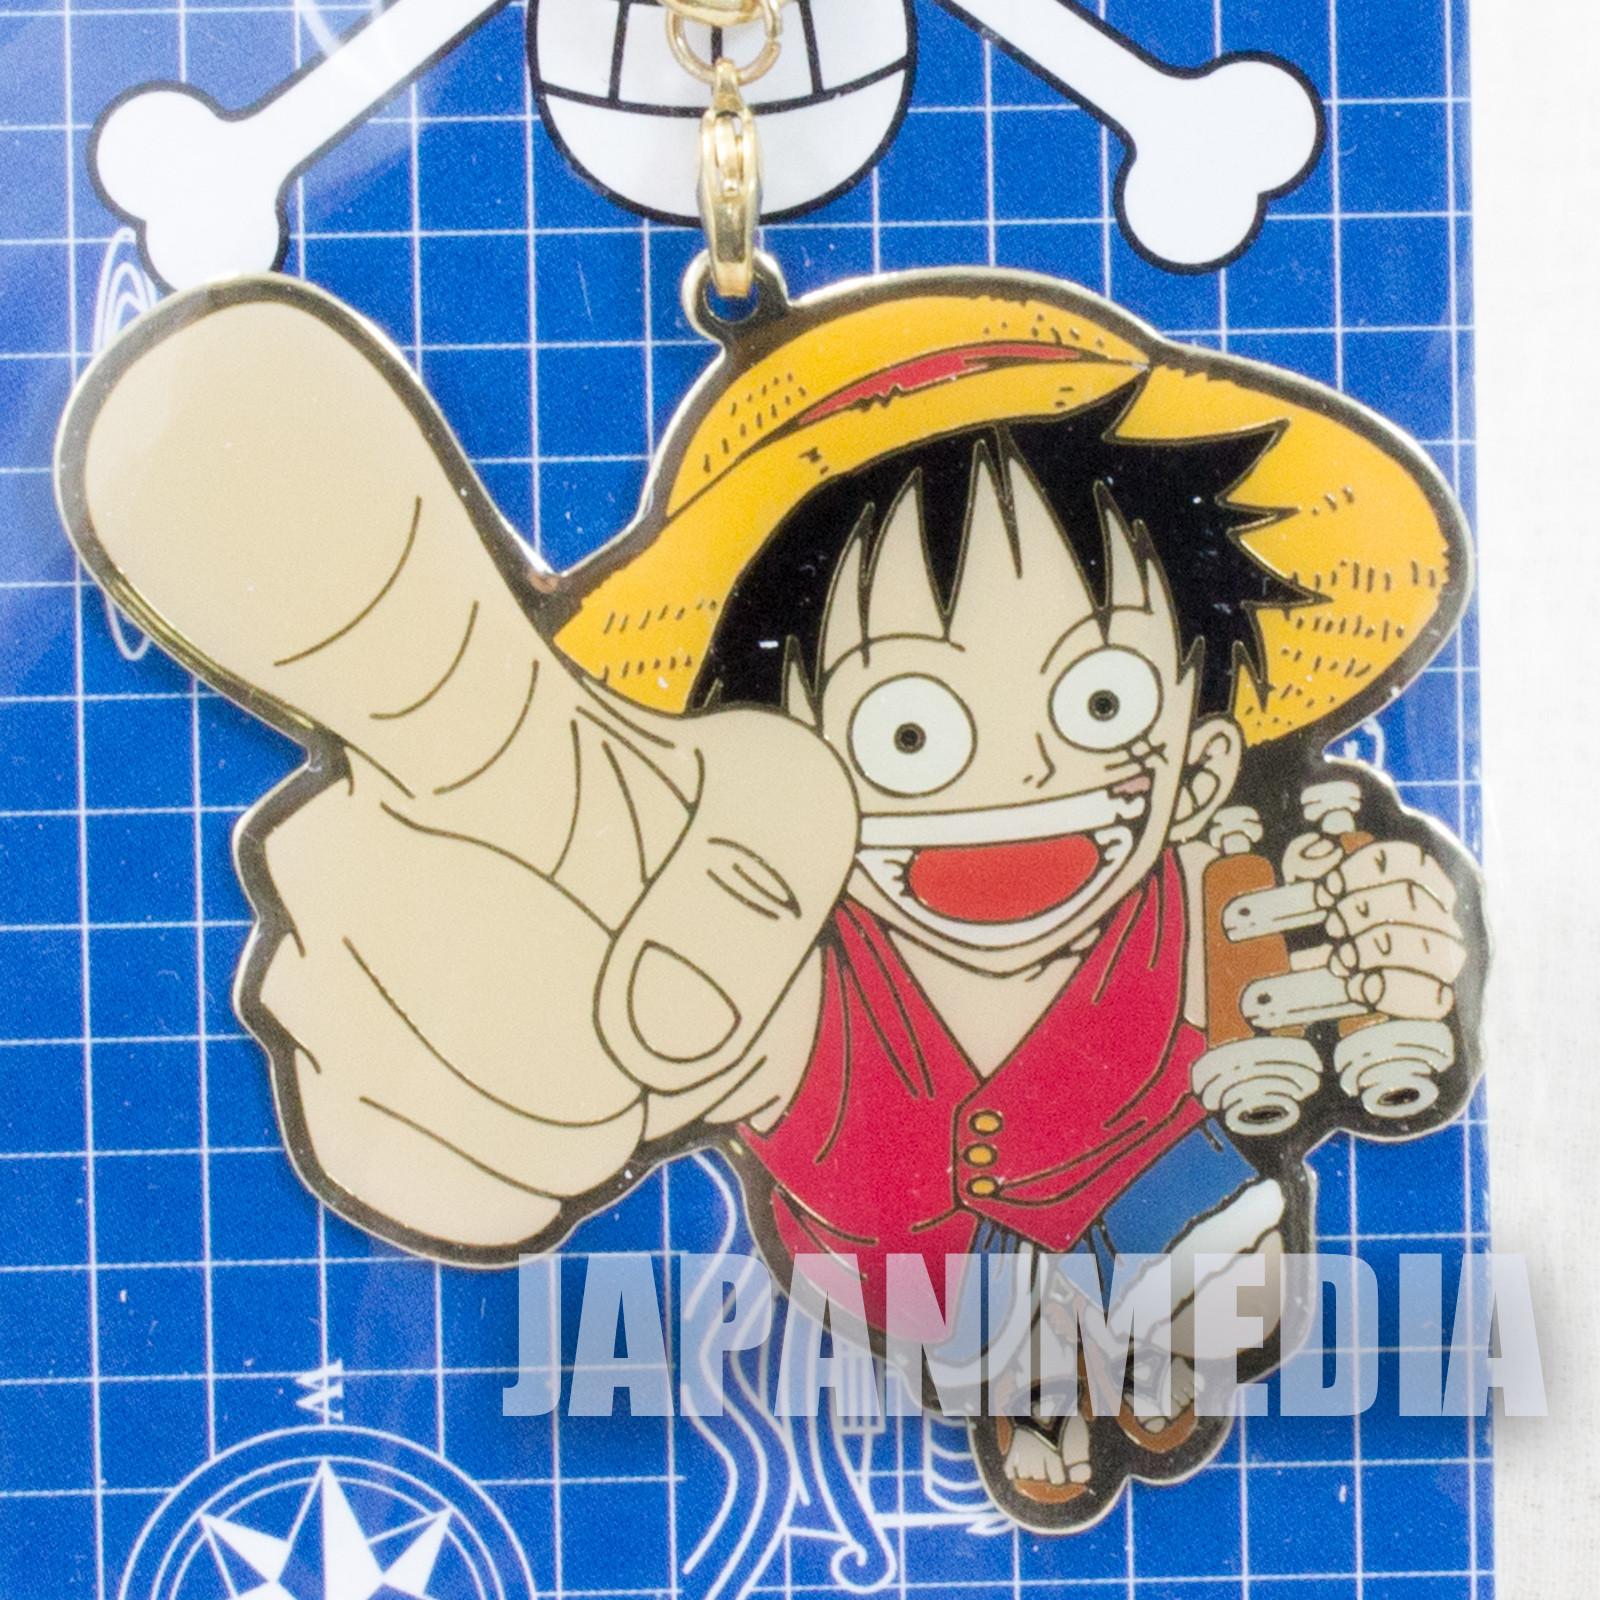 One Piece Luffy Metal Charm Keychain Shonen Jump JAPAN ANIME